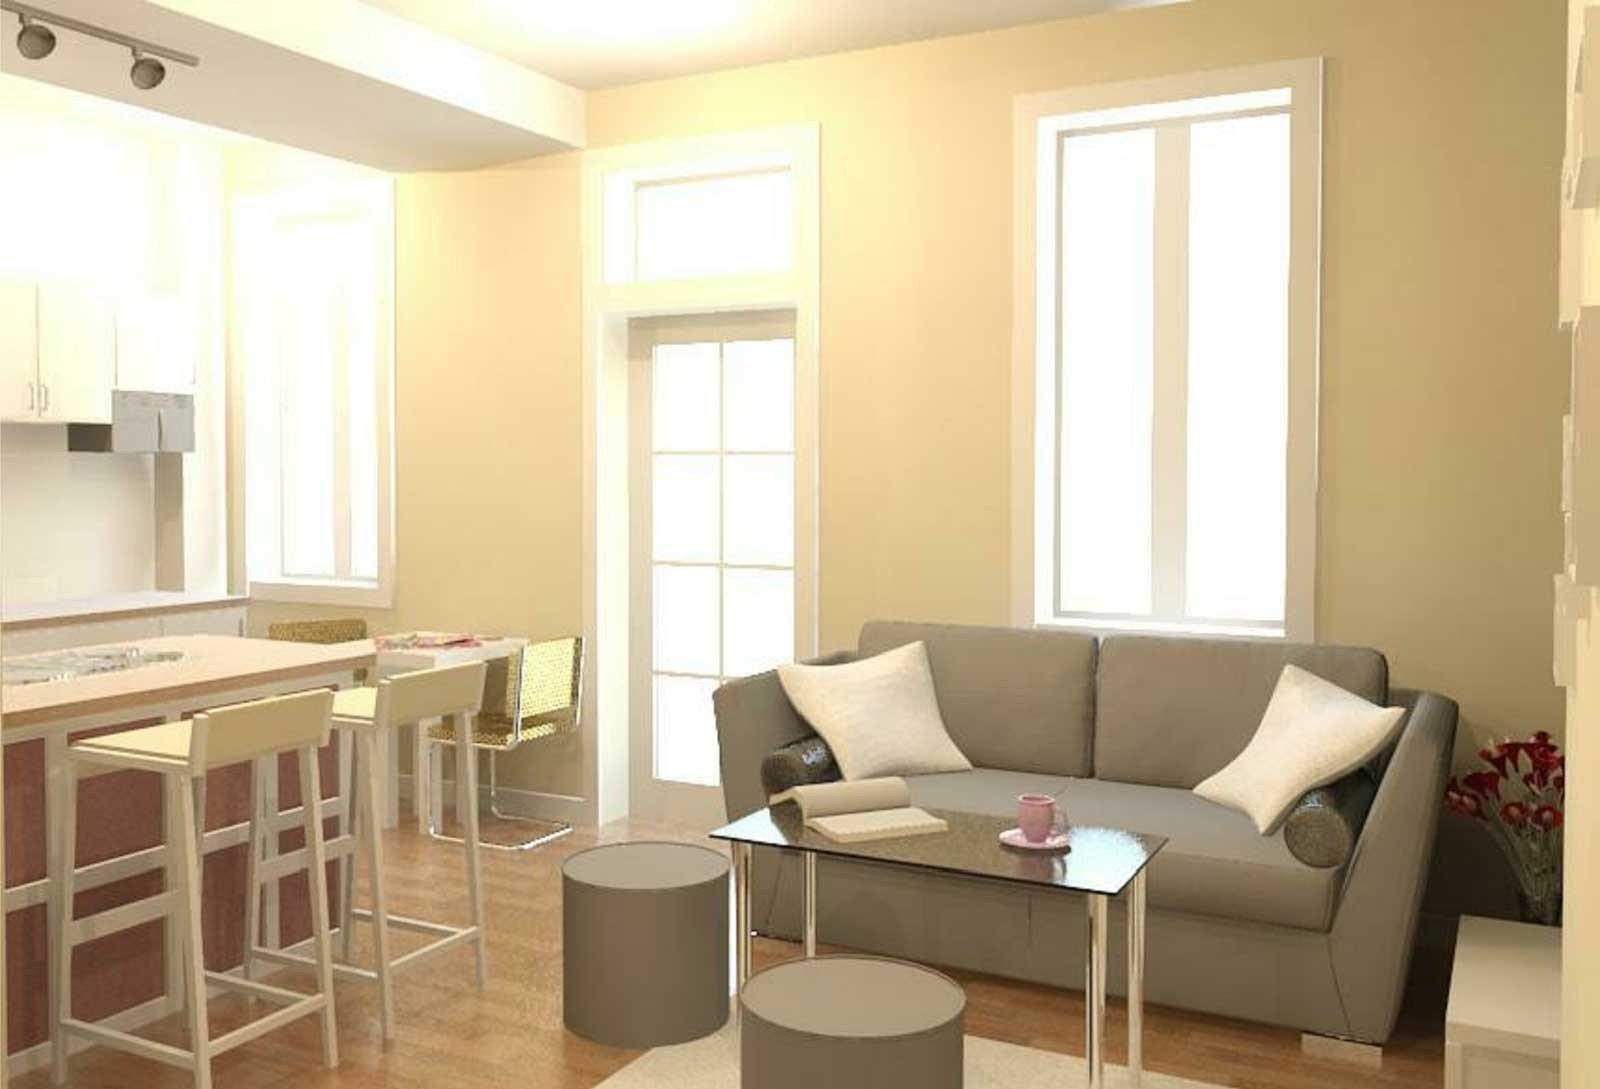 Comfortable Living Room Minimalist Modern Interior Design for Modern Minimalist Home Amaza